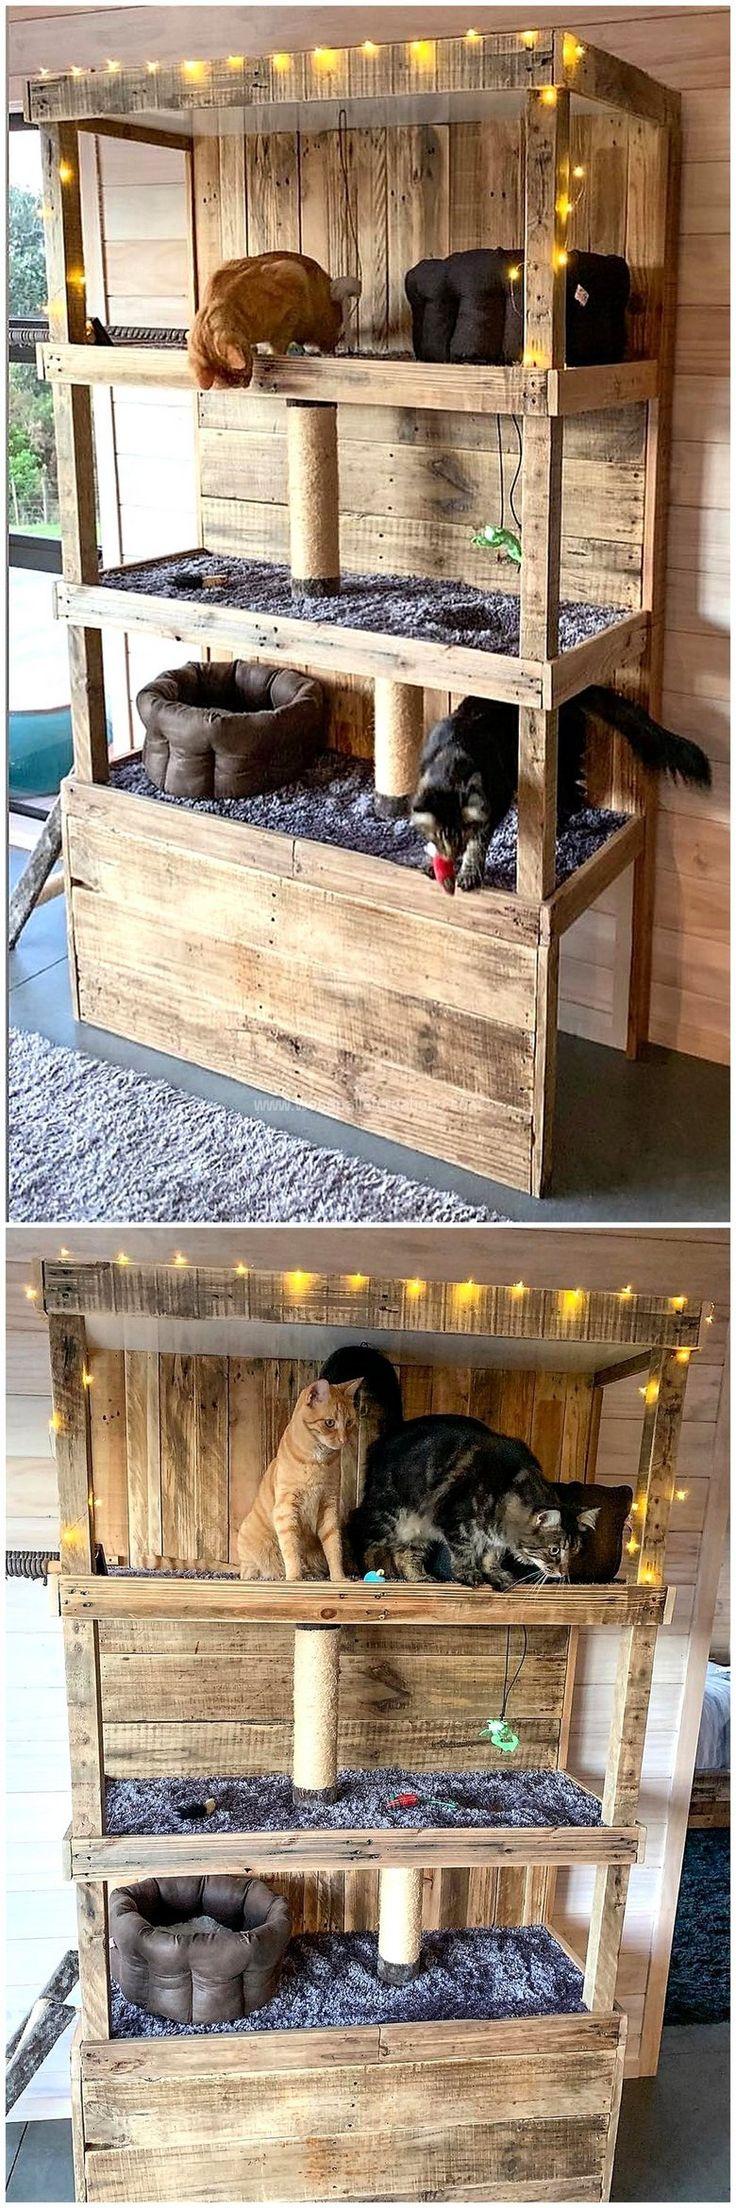 Unique Ideas for Old Pallet Wood Reusing